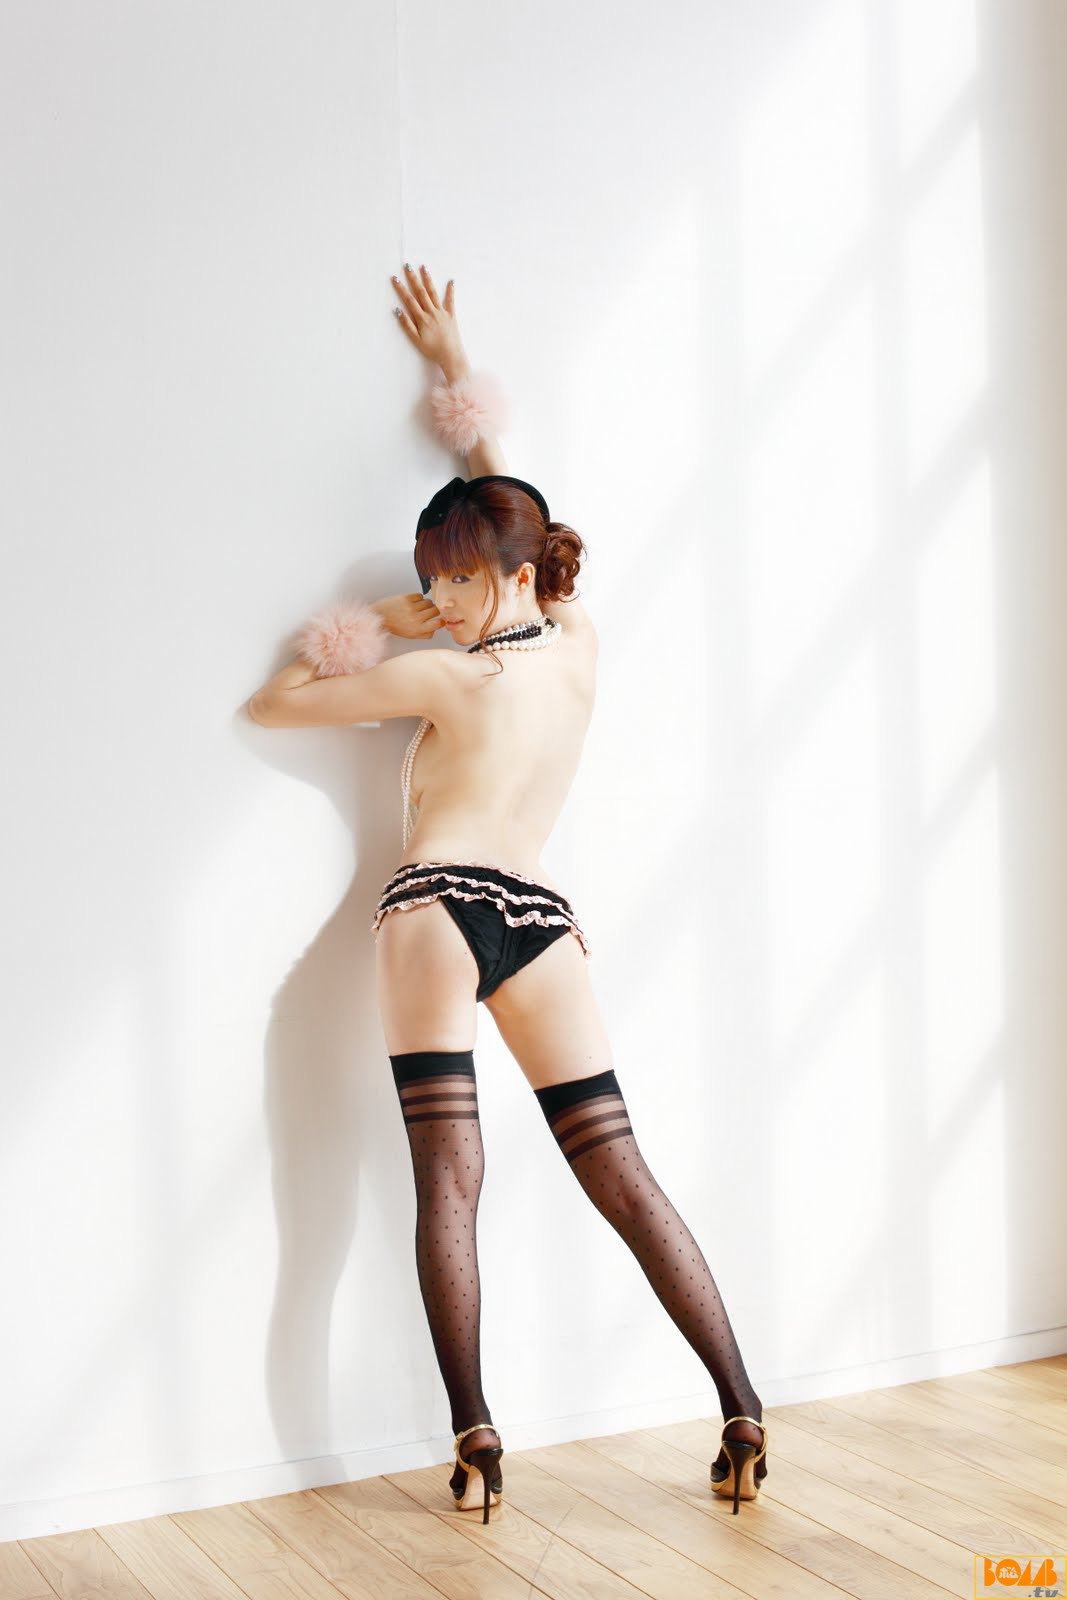 http://1.bp.blogspot.com/_mL74gvvafpo/TLF5QR3wb2I/AAAAAAAAEZE/hcmUVHtTtf4/s1600/yuuri-morishita-real-pearl06.jpg